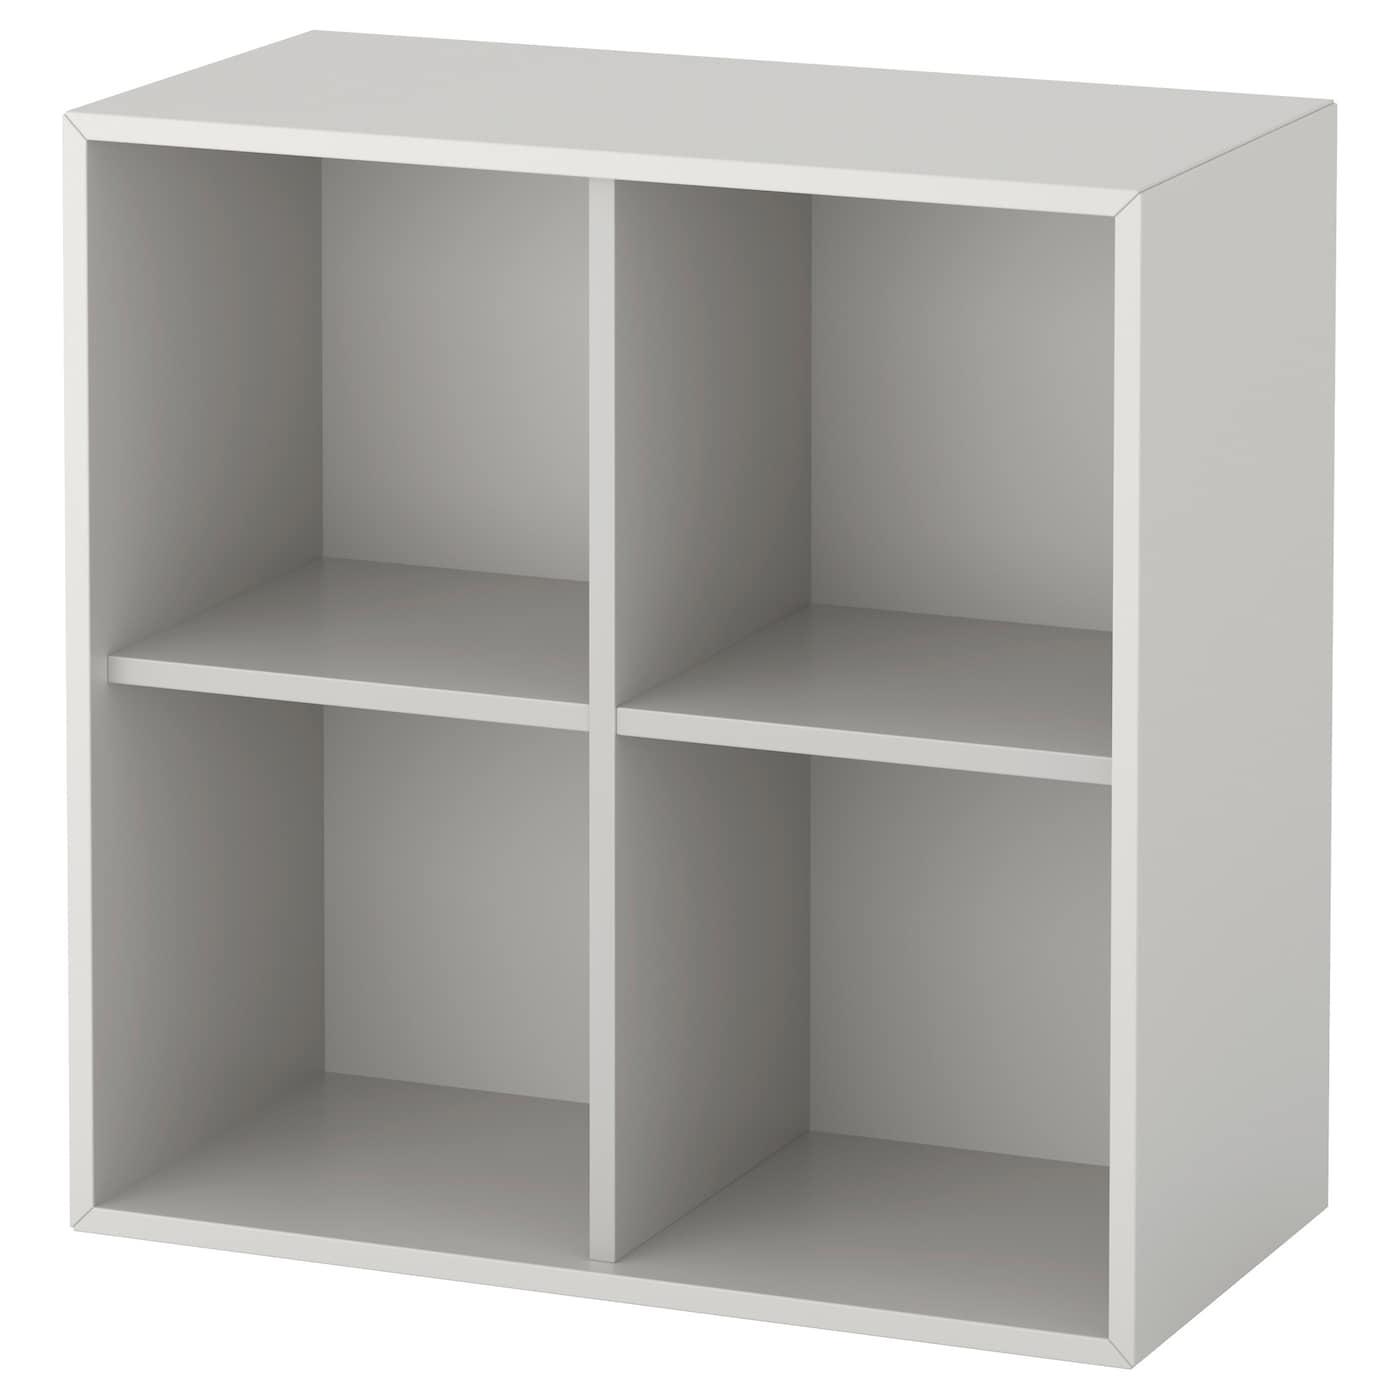 1X 2x 3x 4x Metal shelf Matt Black colour $25//EA 43x11cm